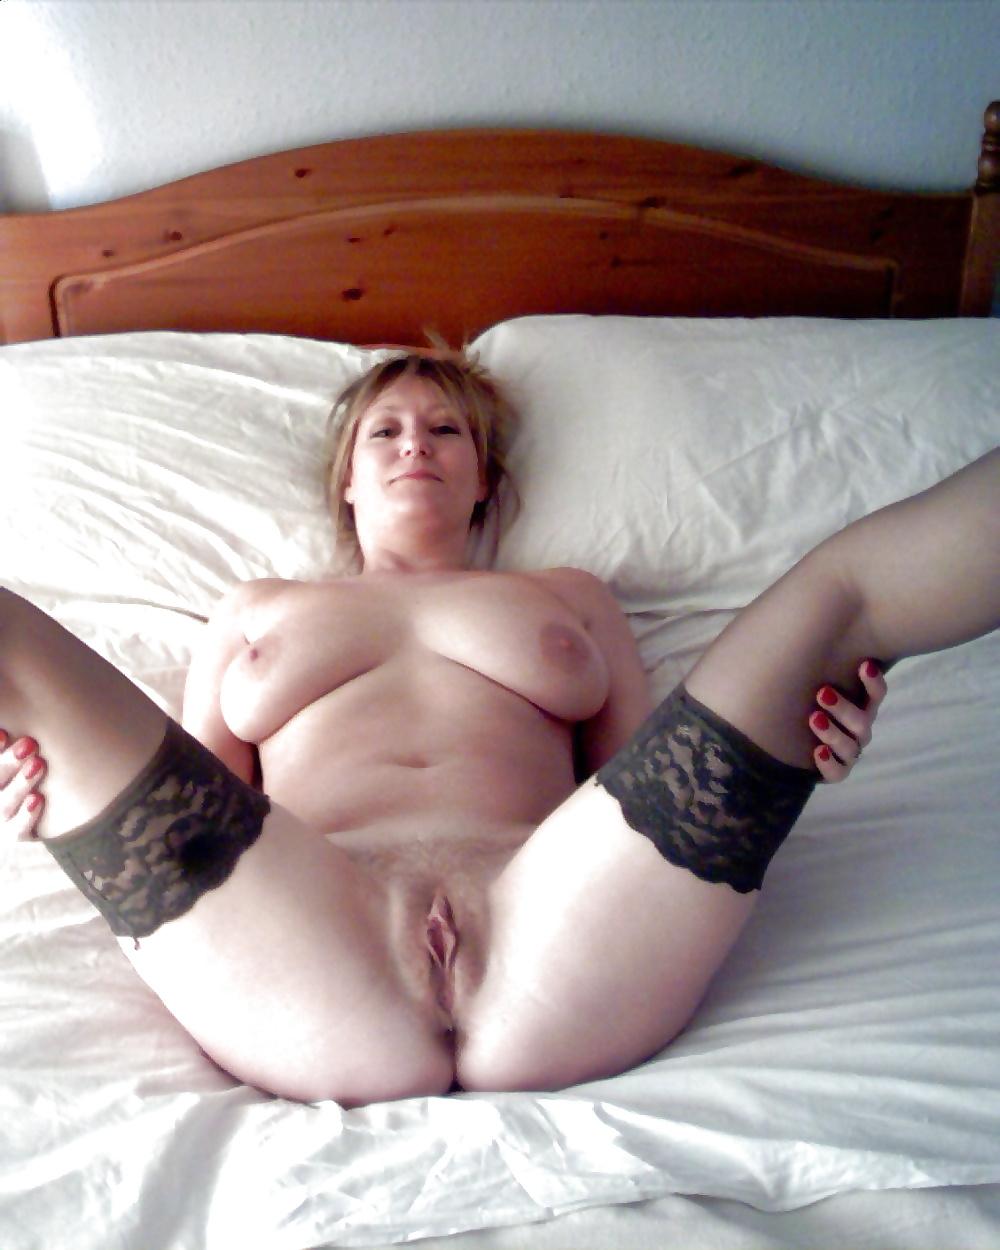 desi girl taking photo porn